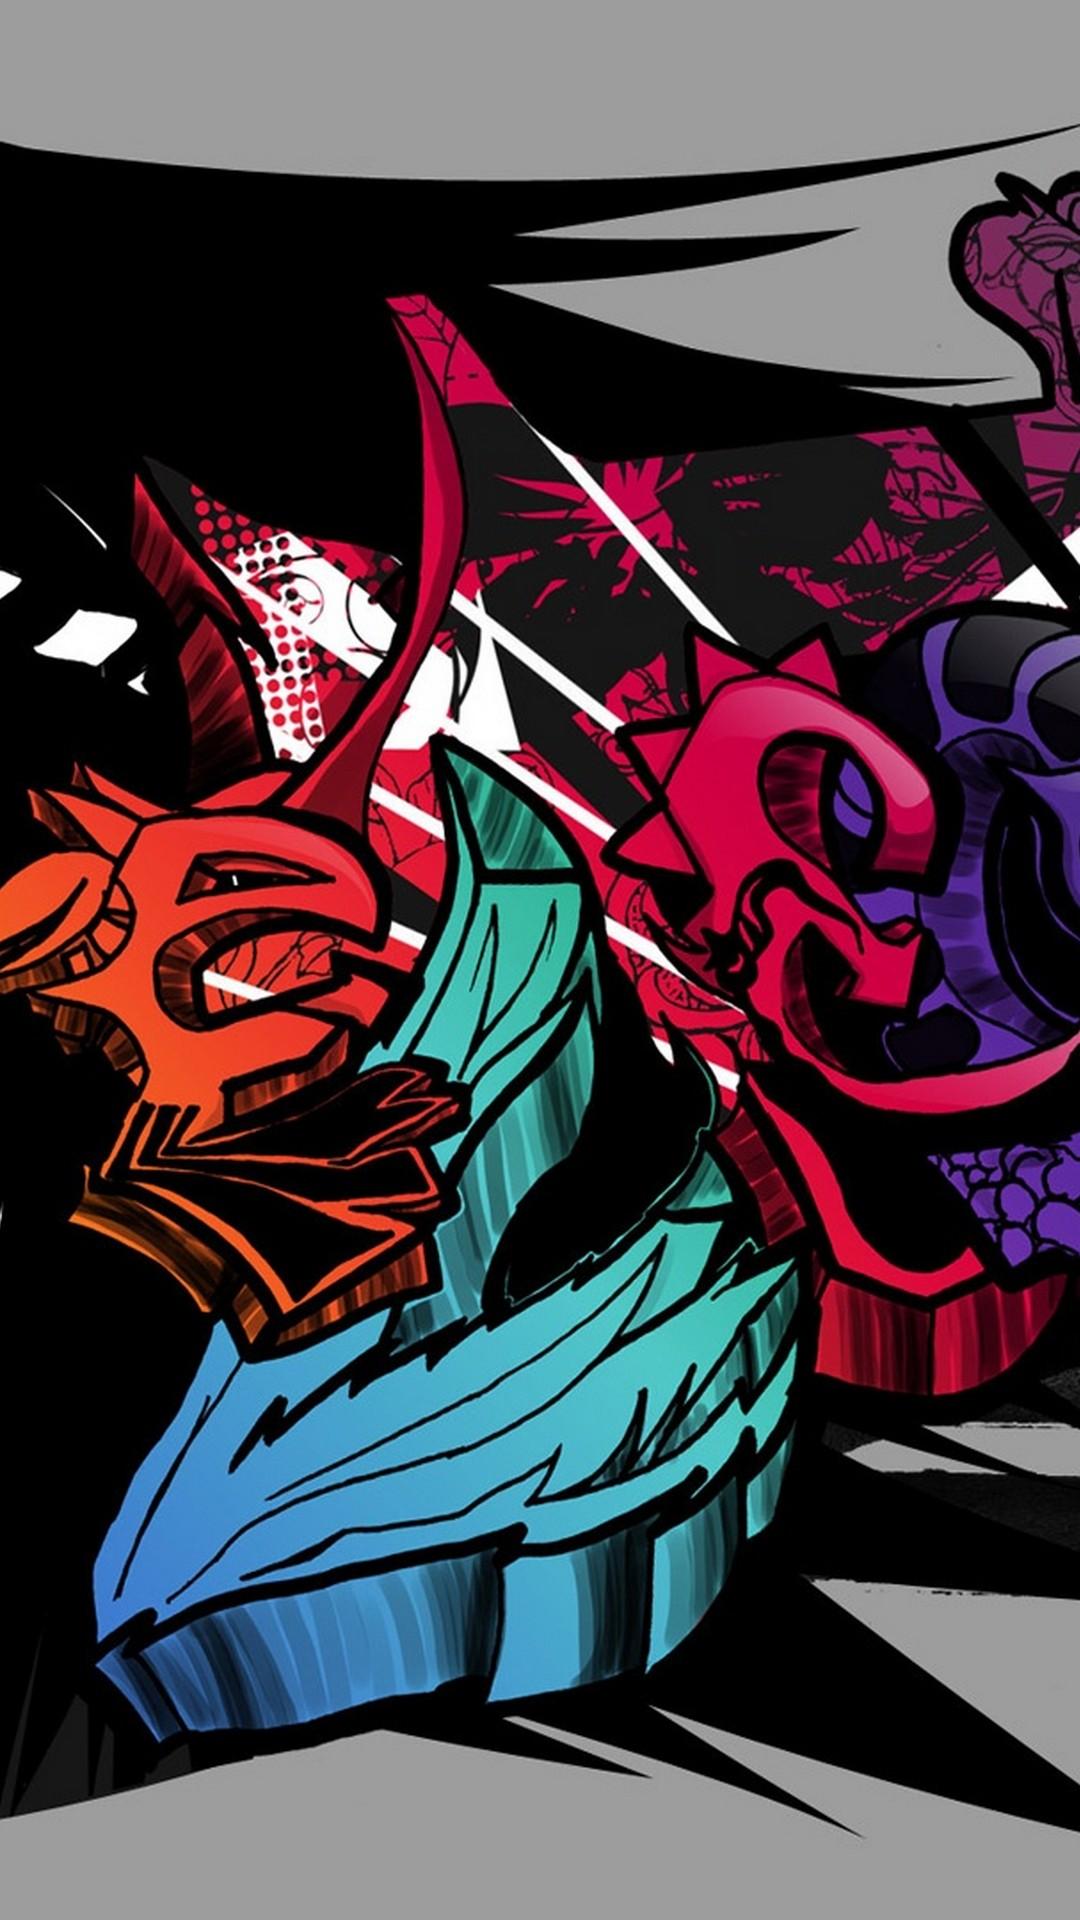 Graffiti Font Different Color Wallpaper